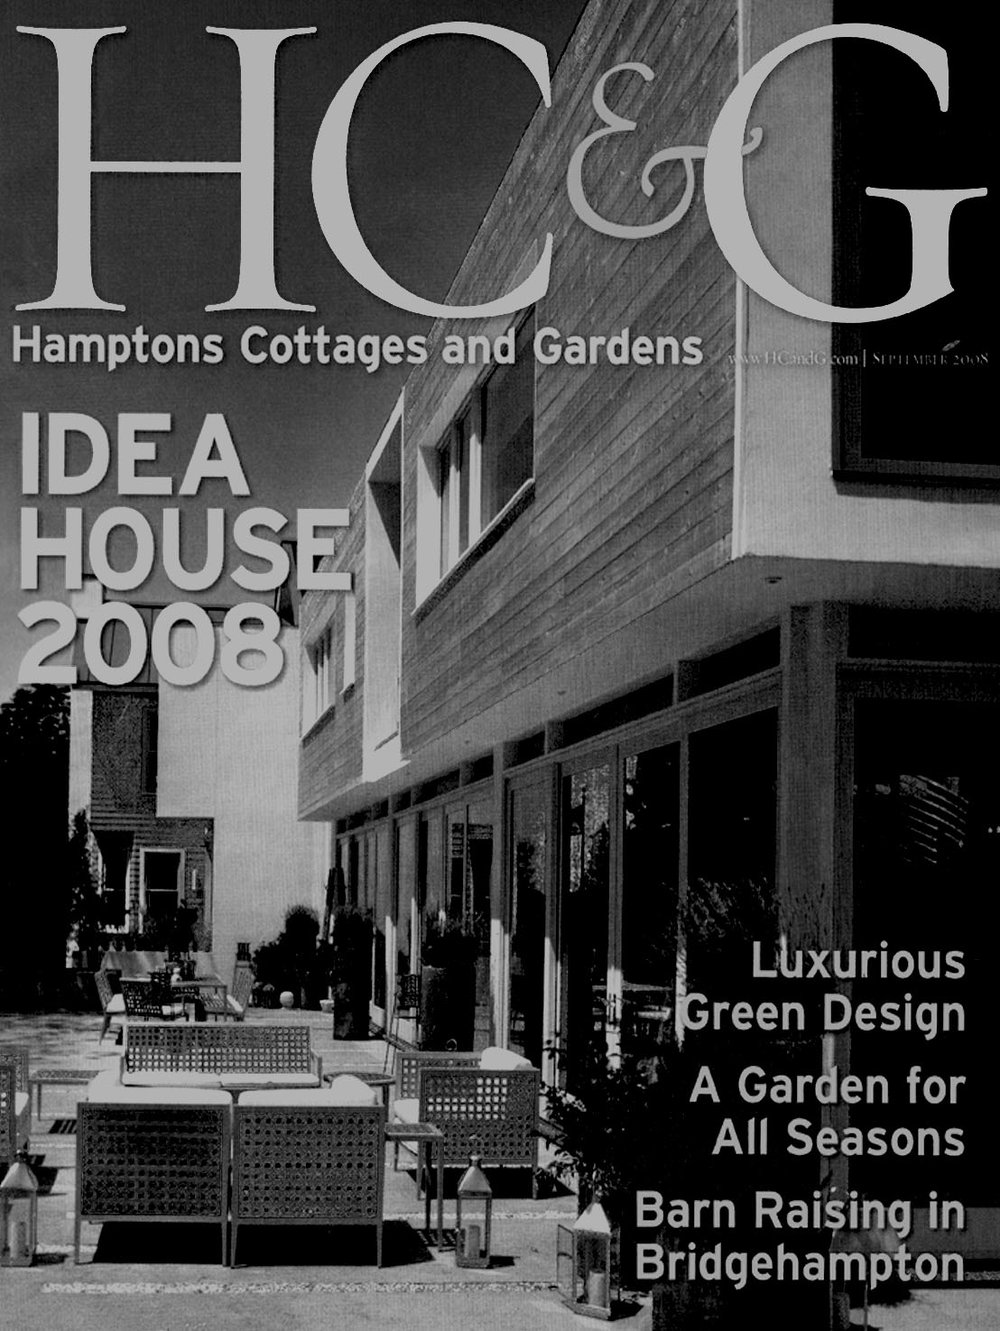 New York, NY Hotel Interior Design Firms - Joe Ginsberg Design |